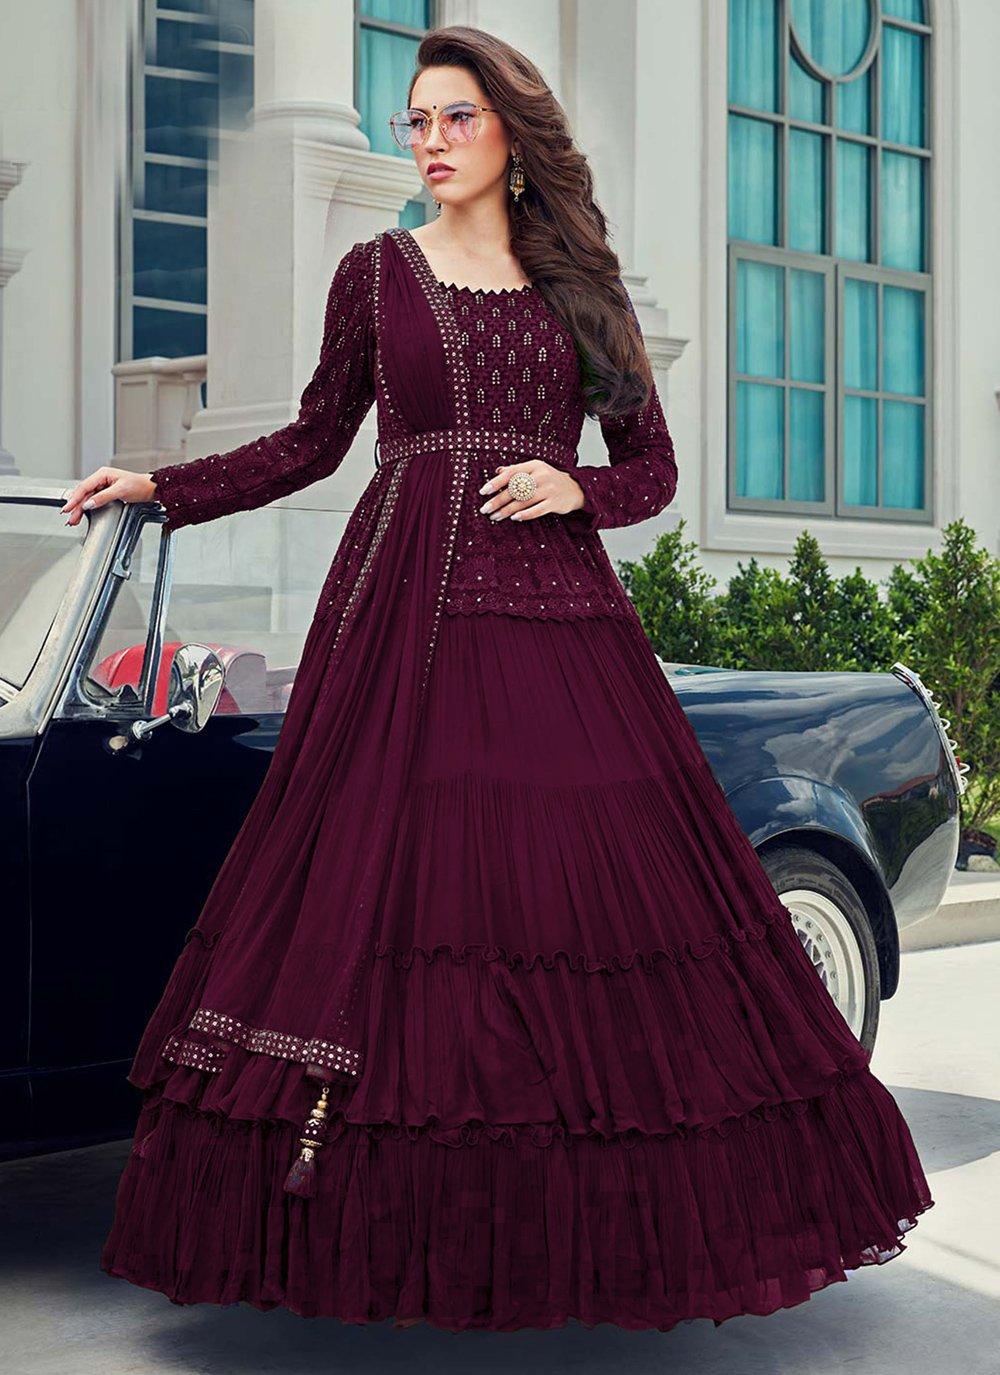 Faux Georgette Sequins Anarkali Salwar Suit in Wine